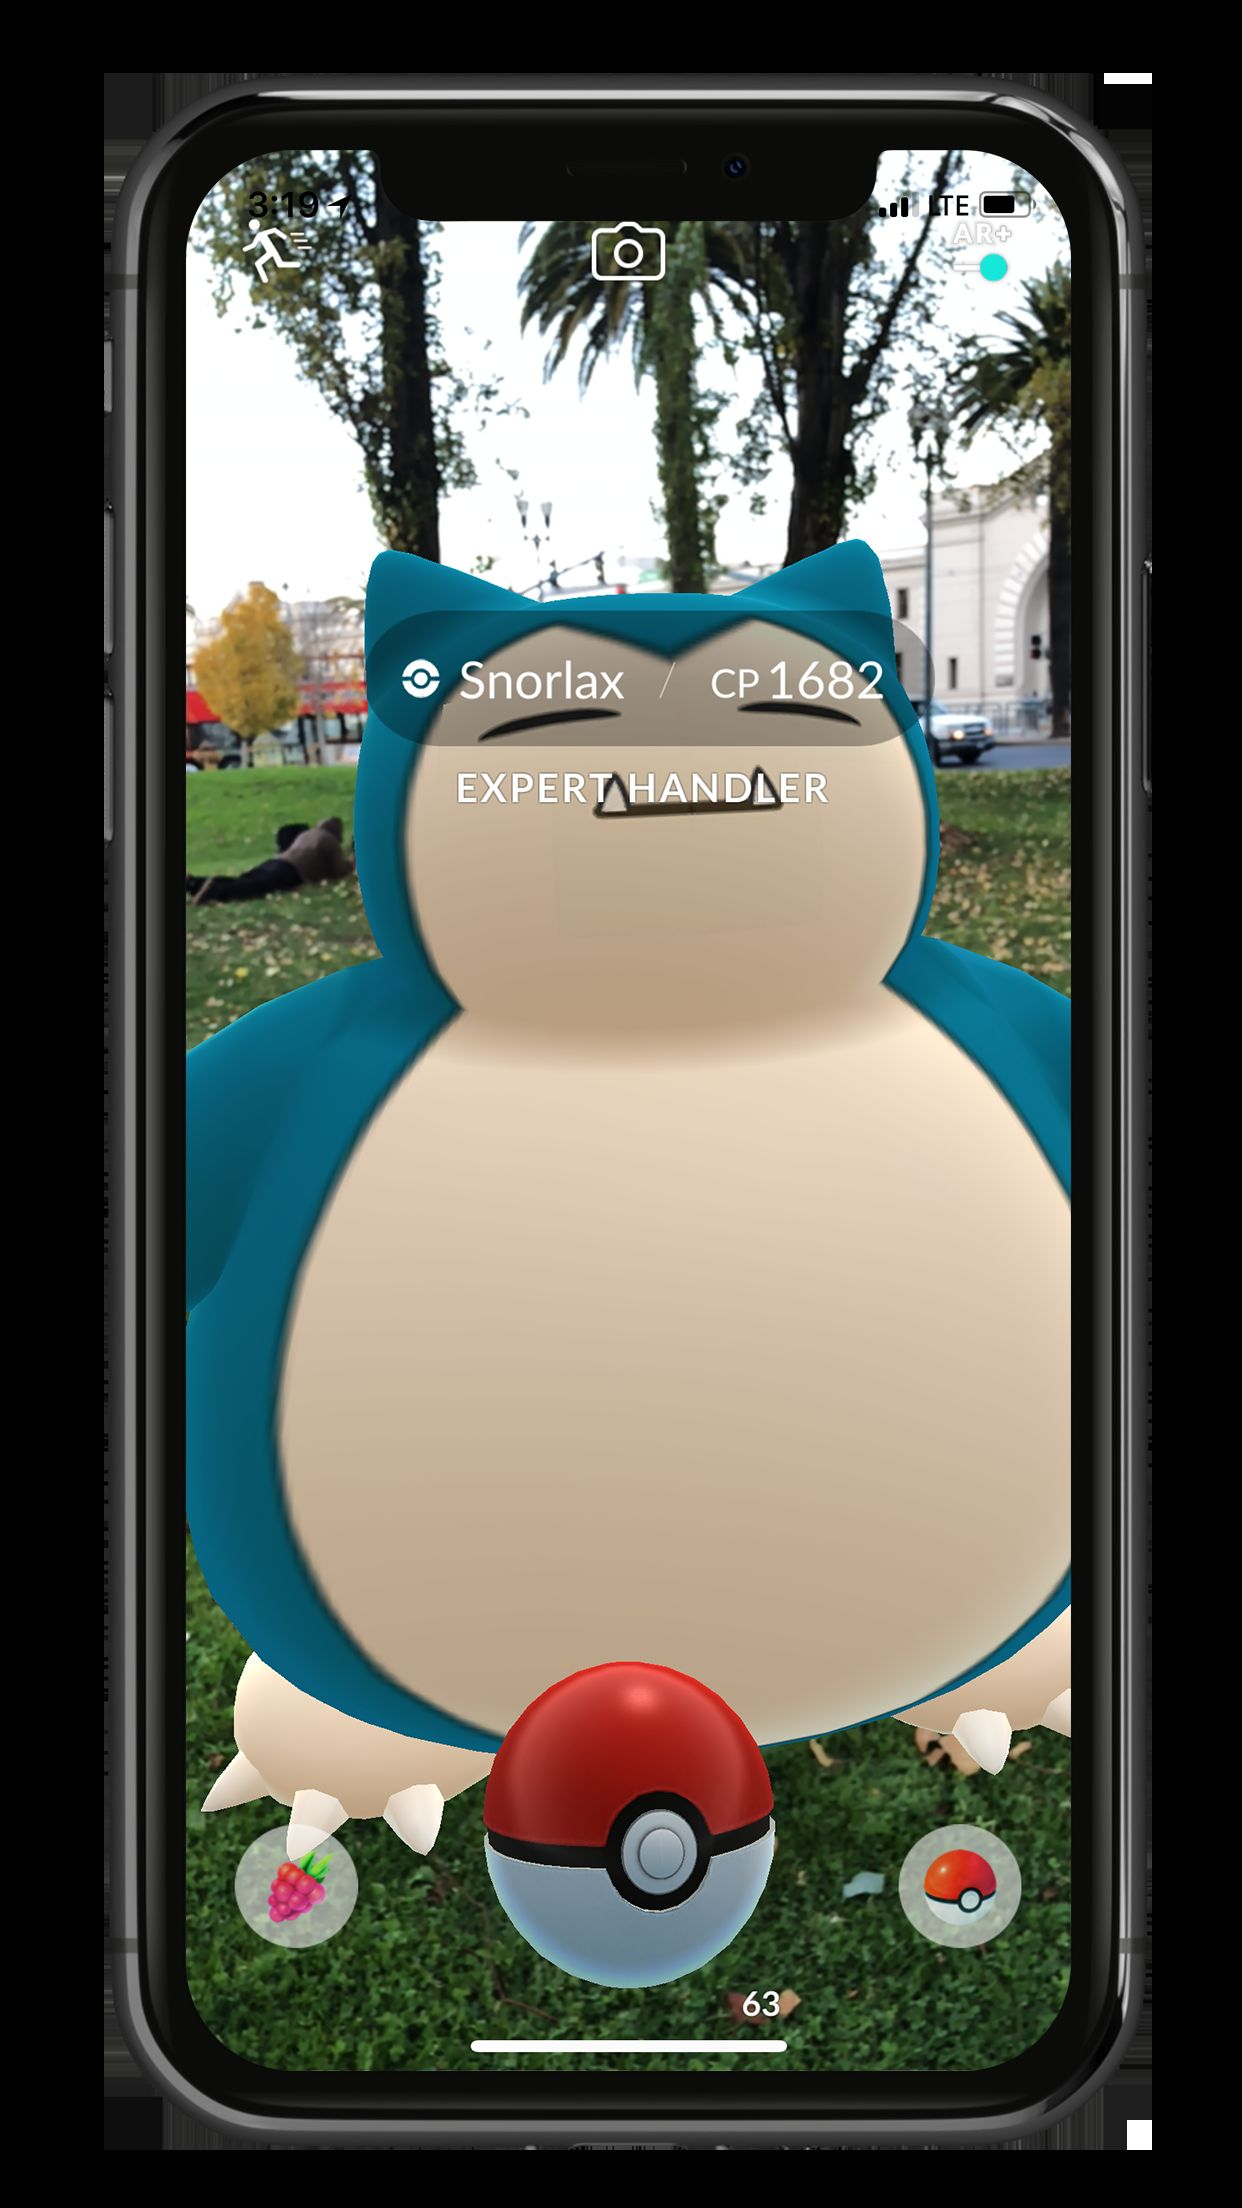 Pokémon GO getting AR+ mode on iOS 11 devices - Perfectly Nintendo